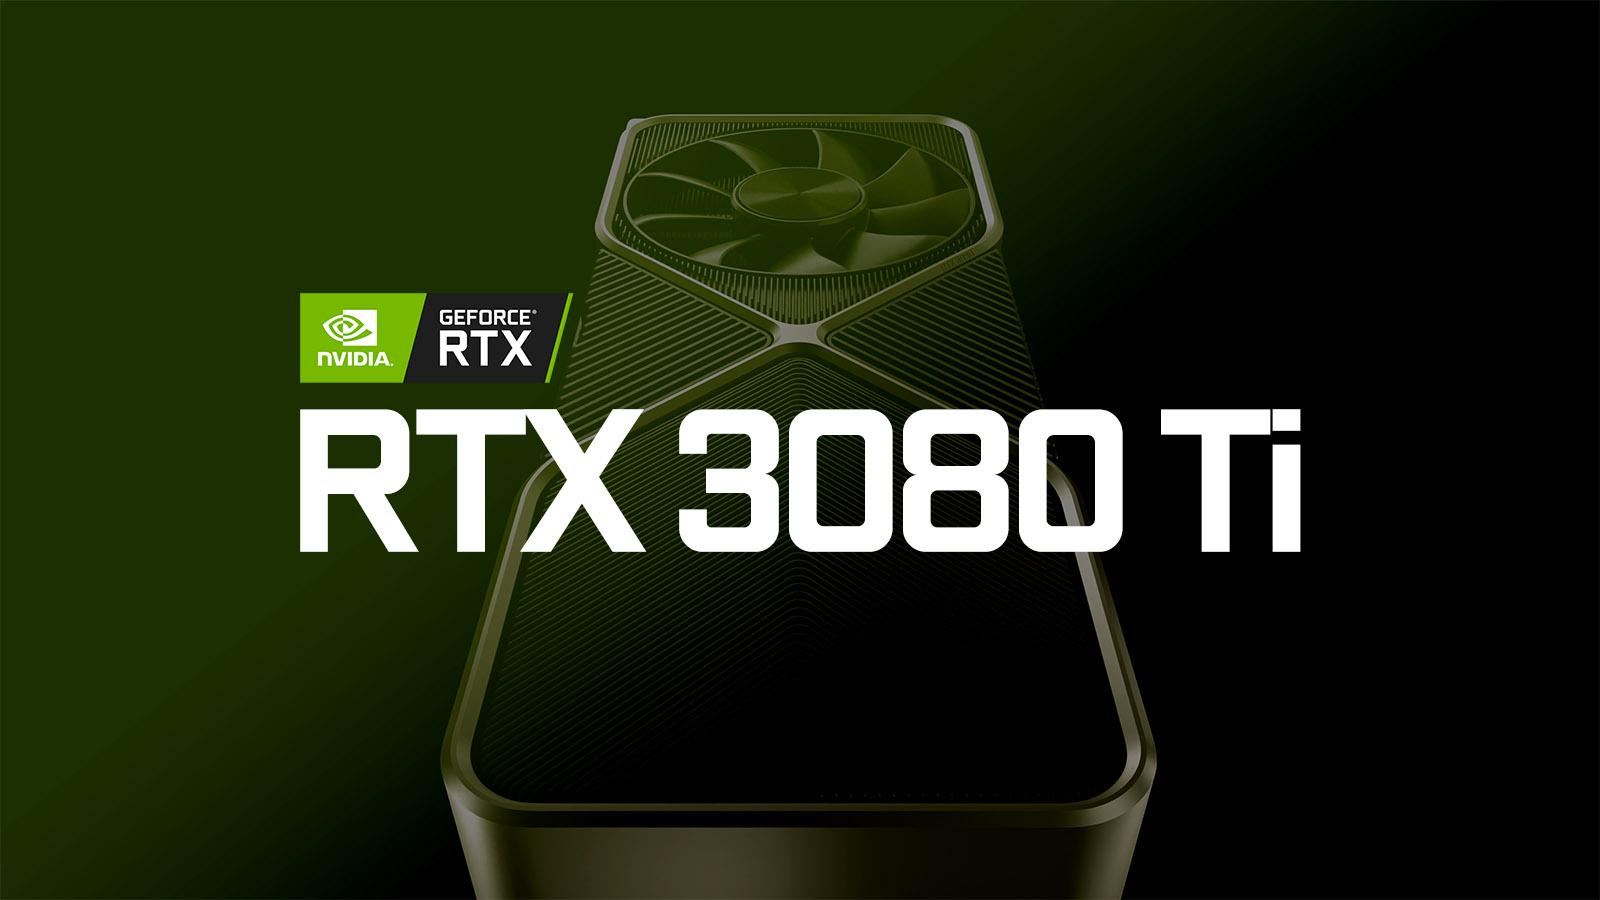 NVIDIA GeForce RTX 3080 Ti 12 GB Enthusiast Gaming Graphics Card Dilaporkan Diundur Hingga Mei